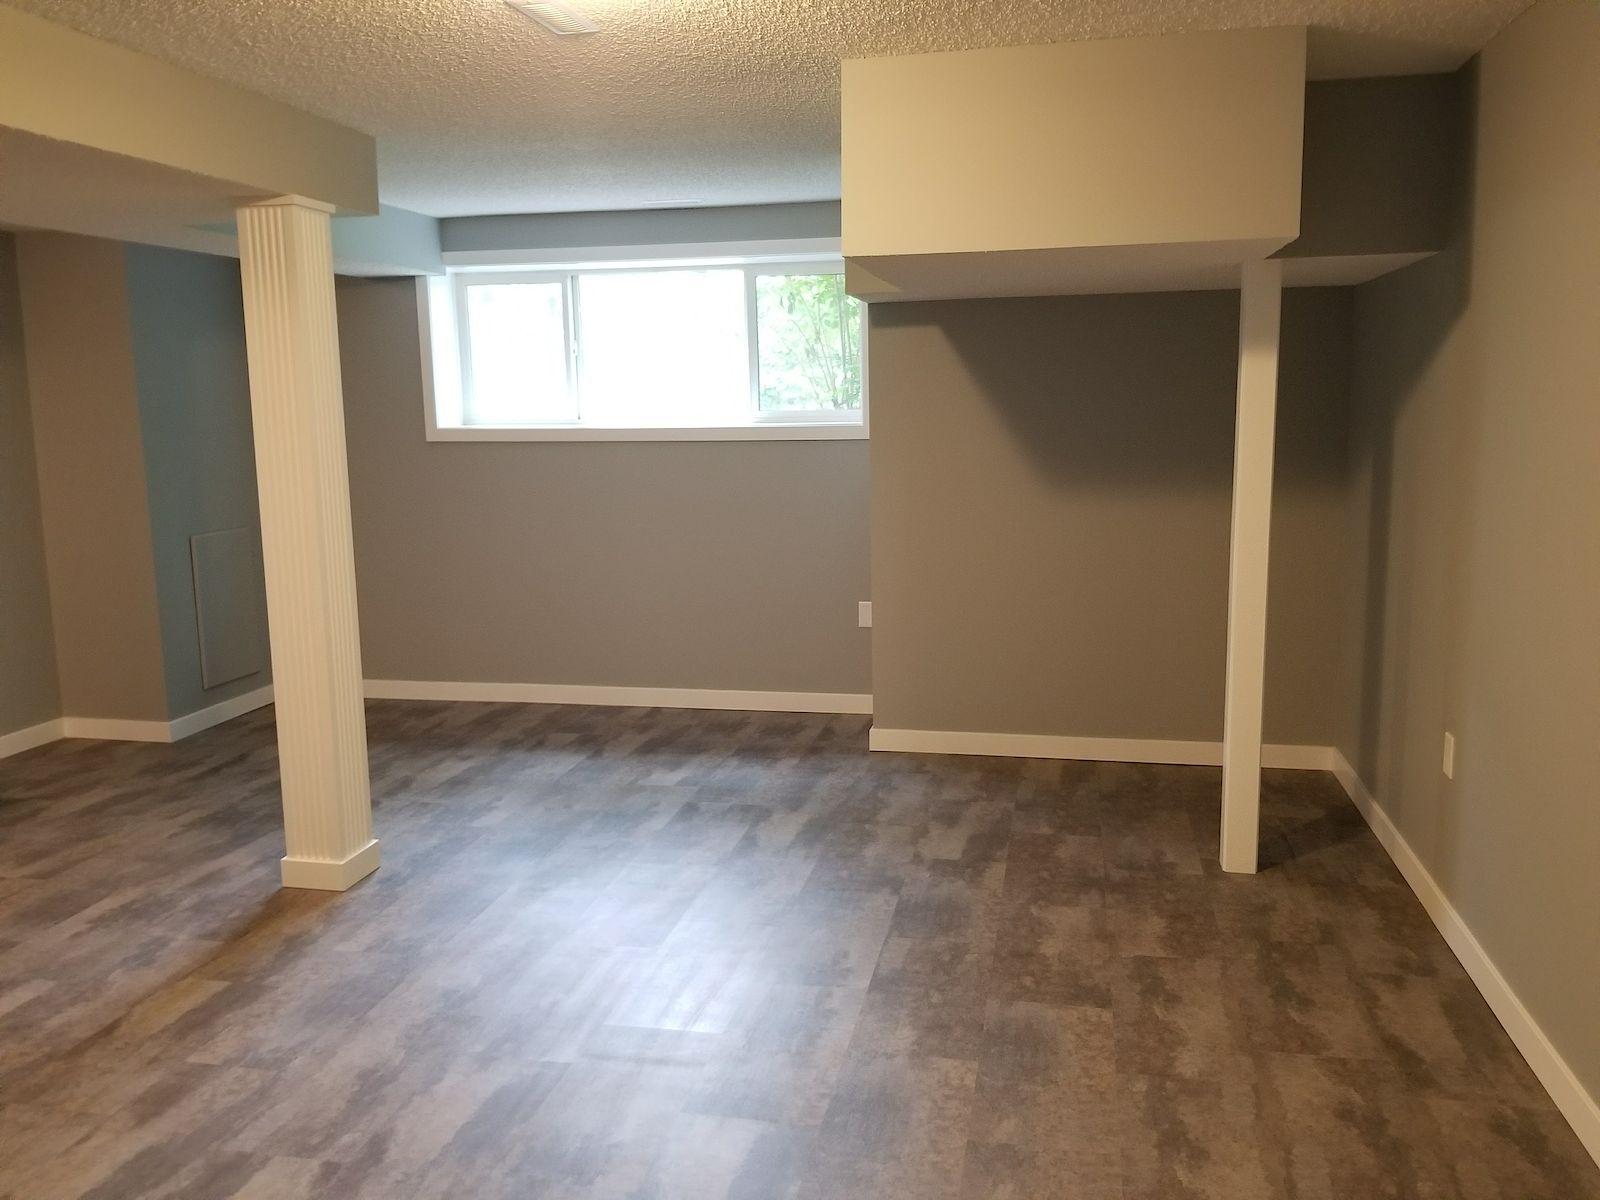 Calgary Basement For Rent - Ogden, - 1 Bedroom Basement